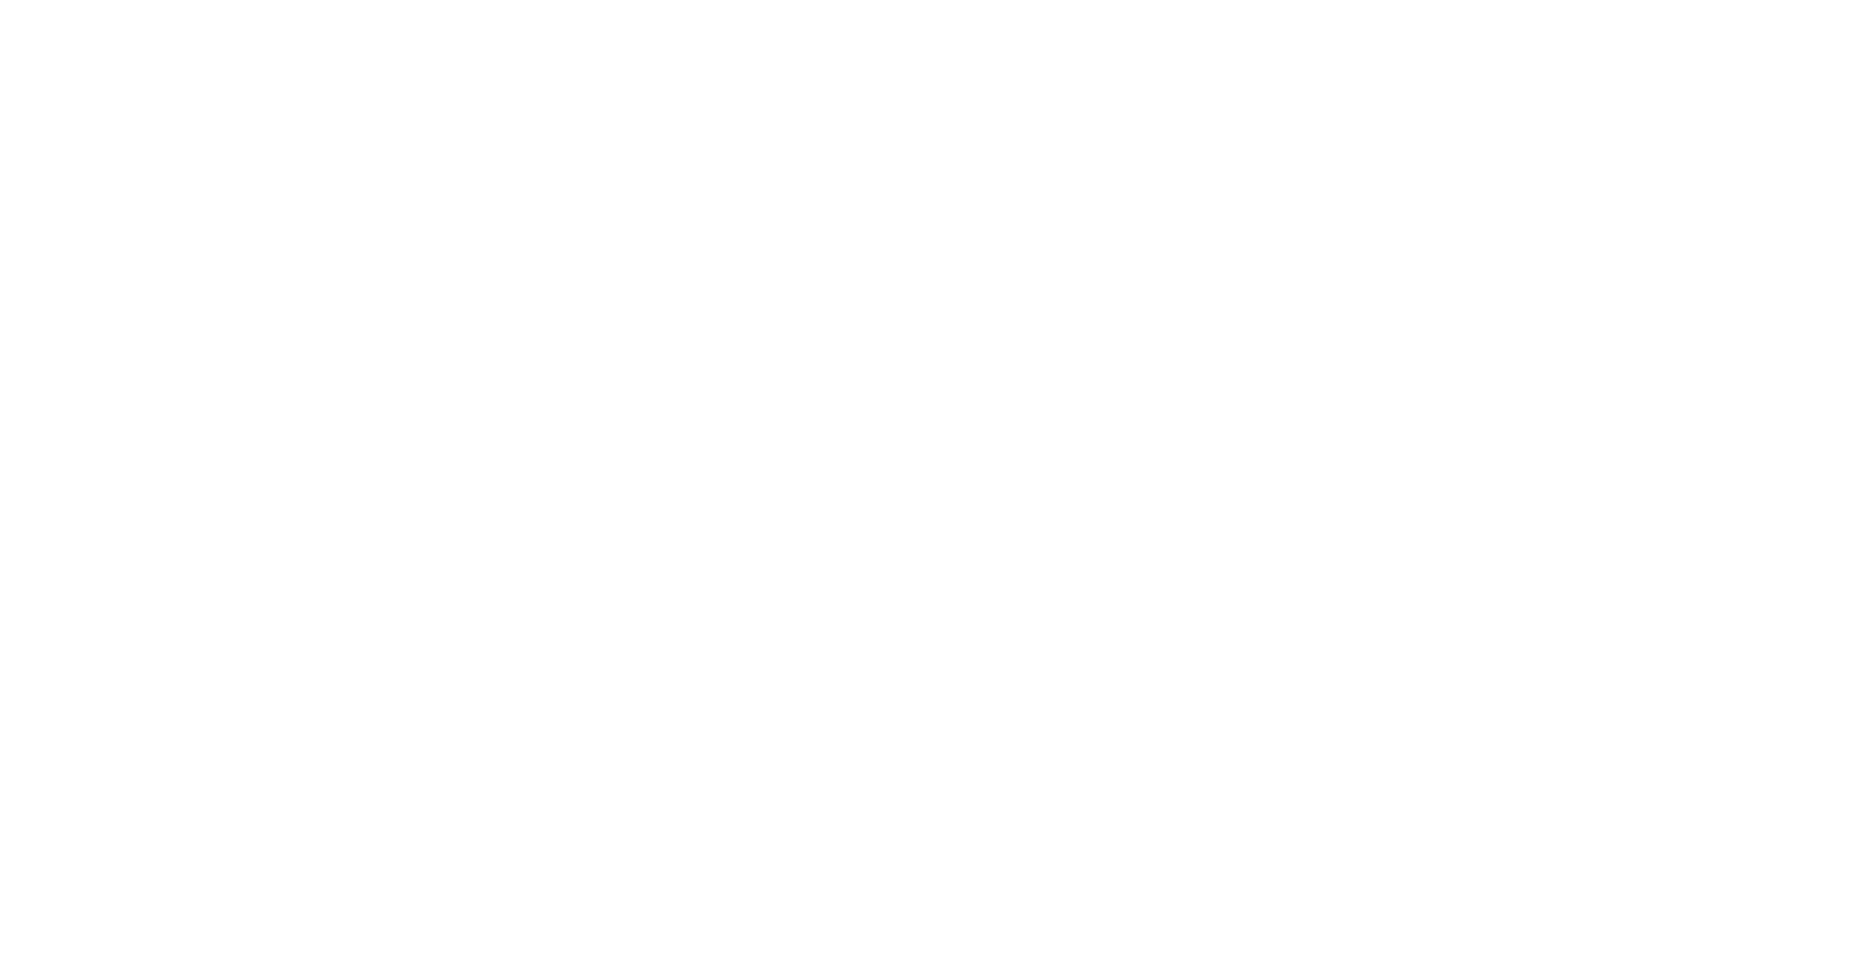 Telling Seafire's Story: Launching Kimpton's First International Luxury Resort